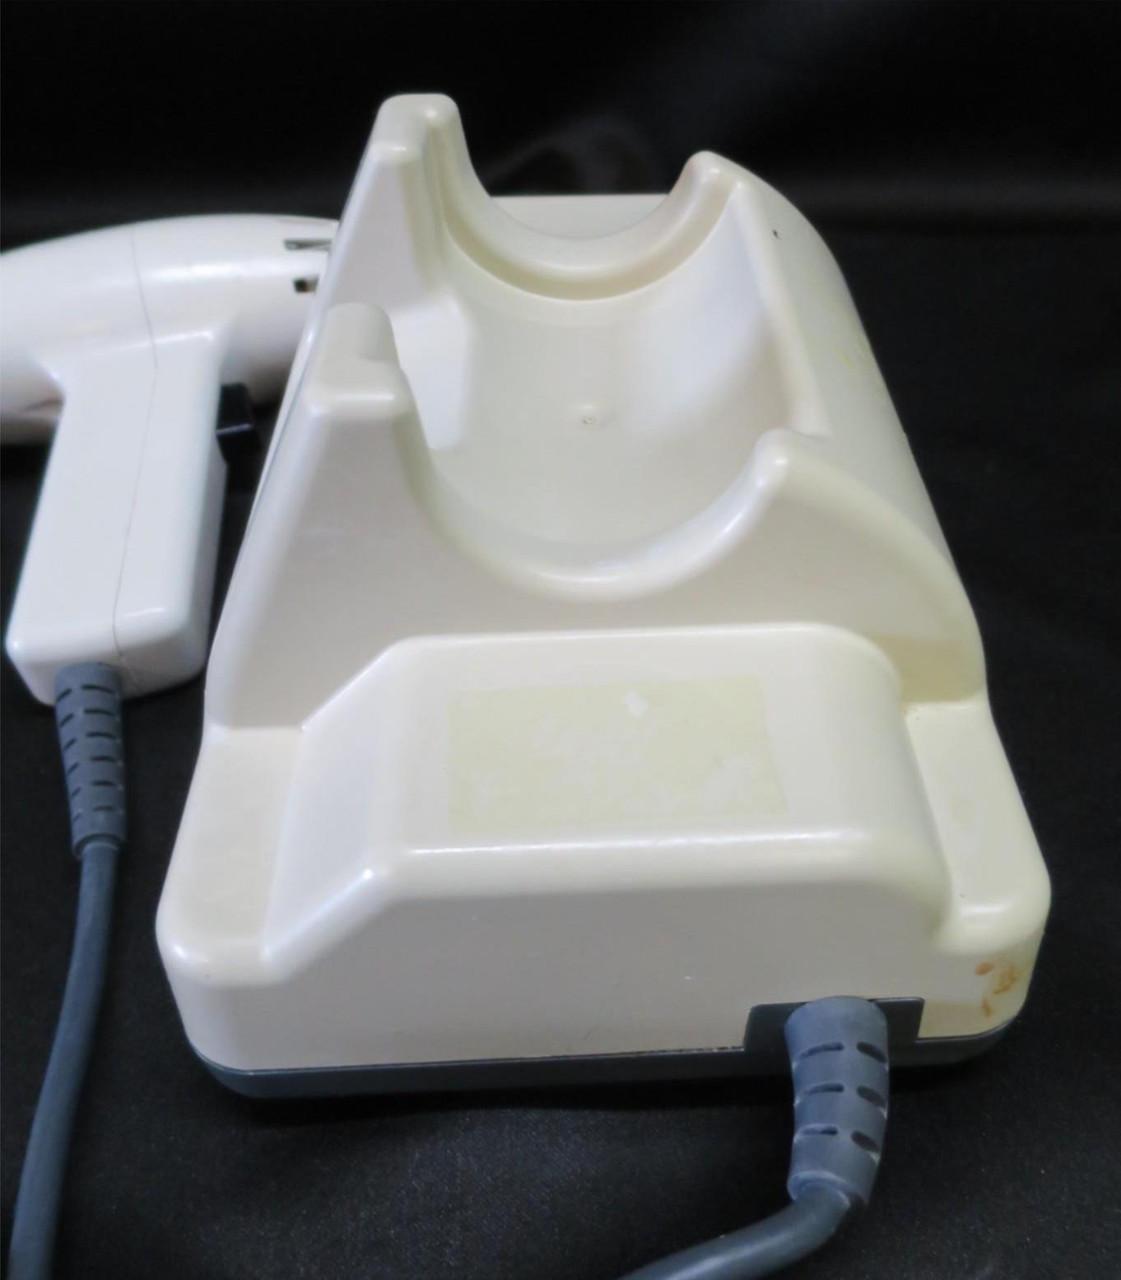 Kerr Demetron LC Dental Activation Curing Light #12